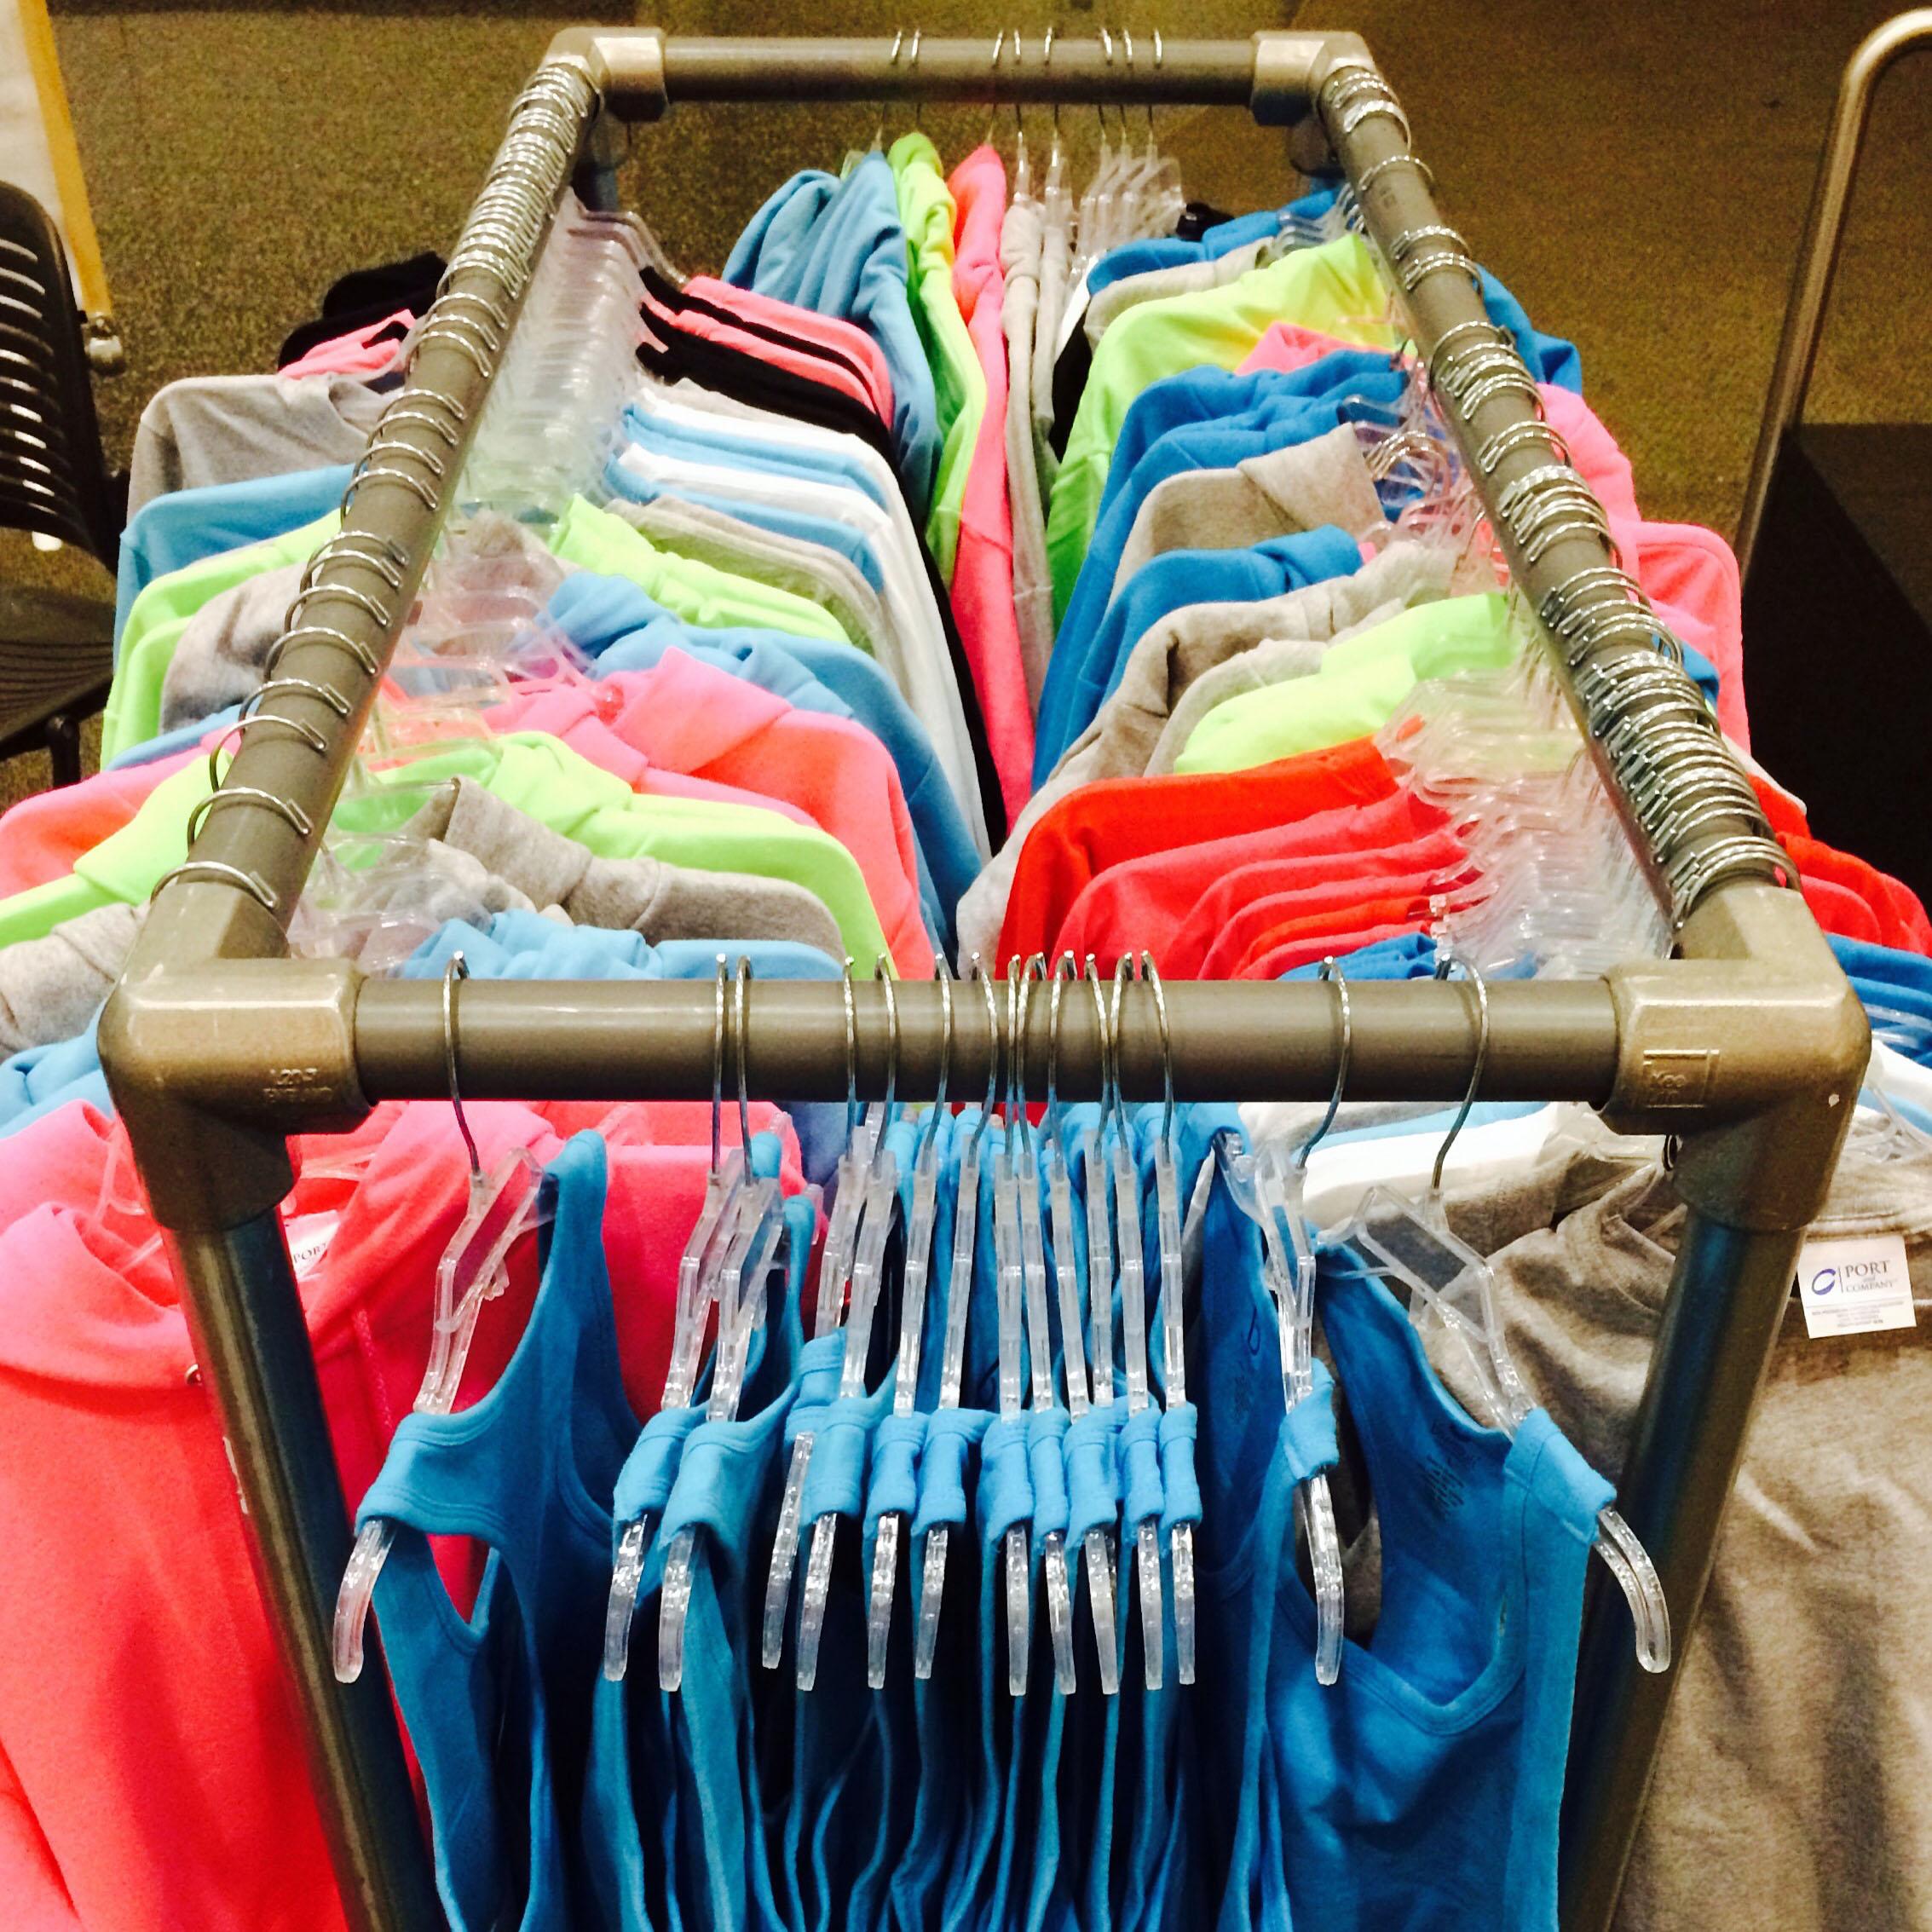 39 diy retail display ideas from clothing racks to for Clothing display ideas for craft shows